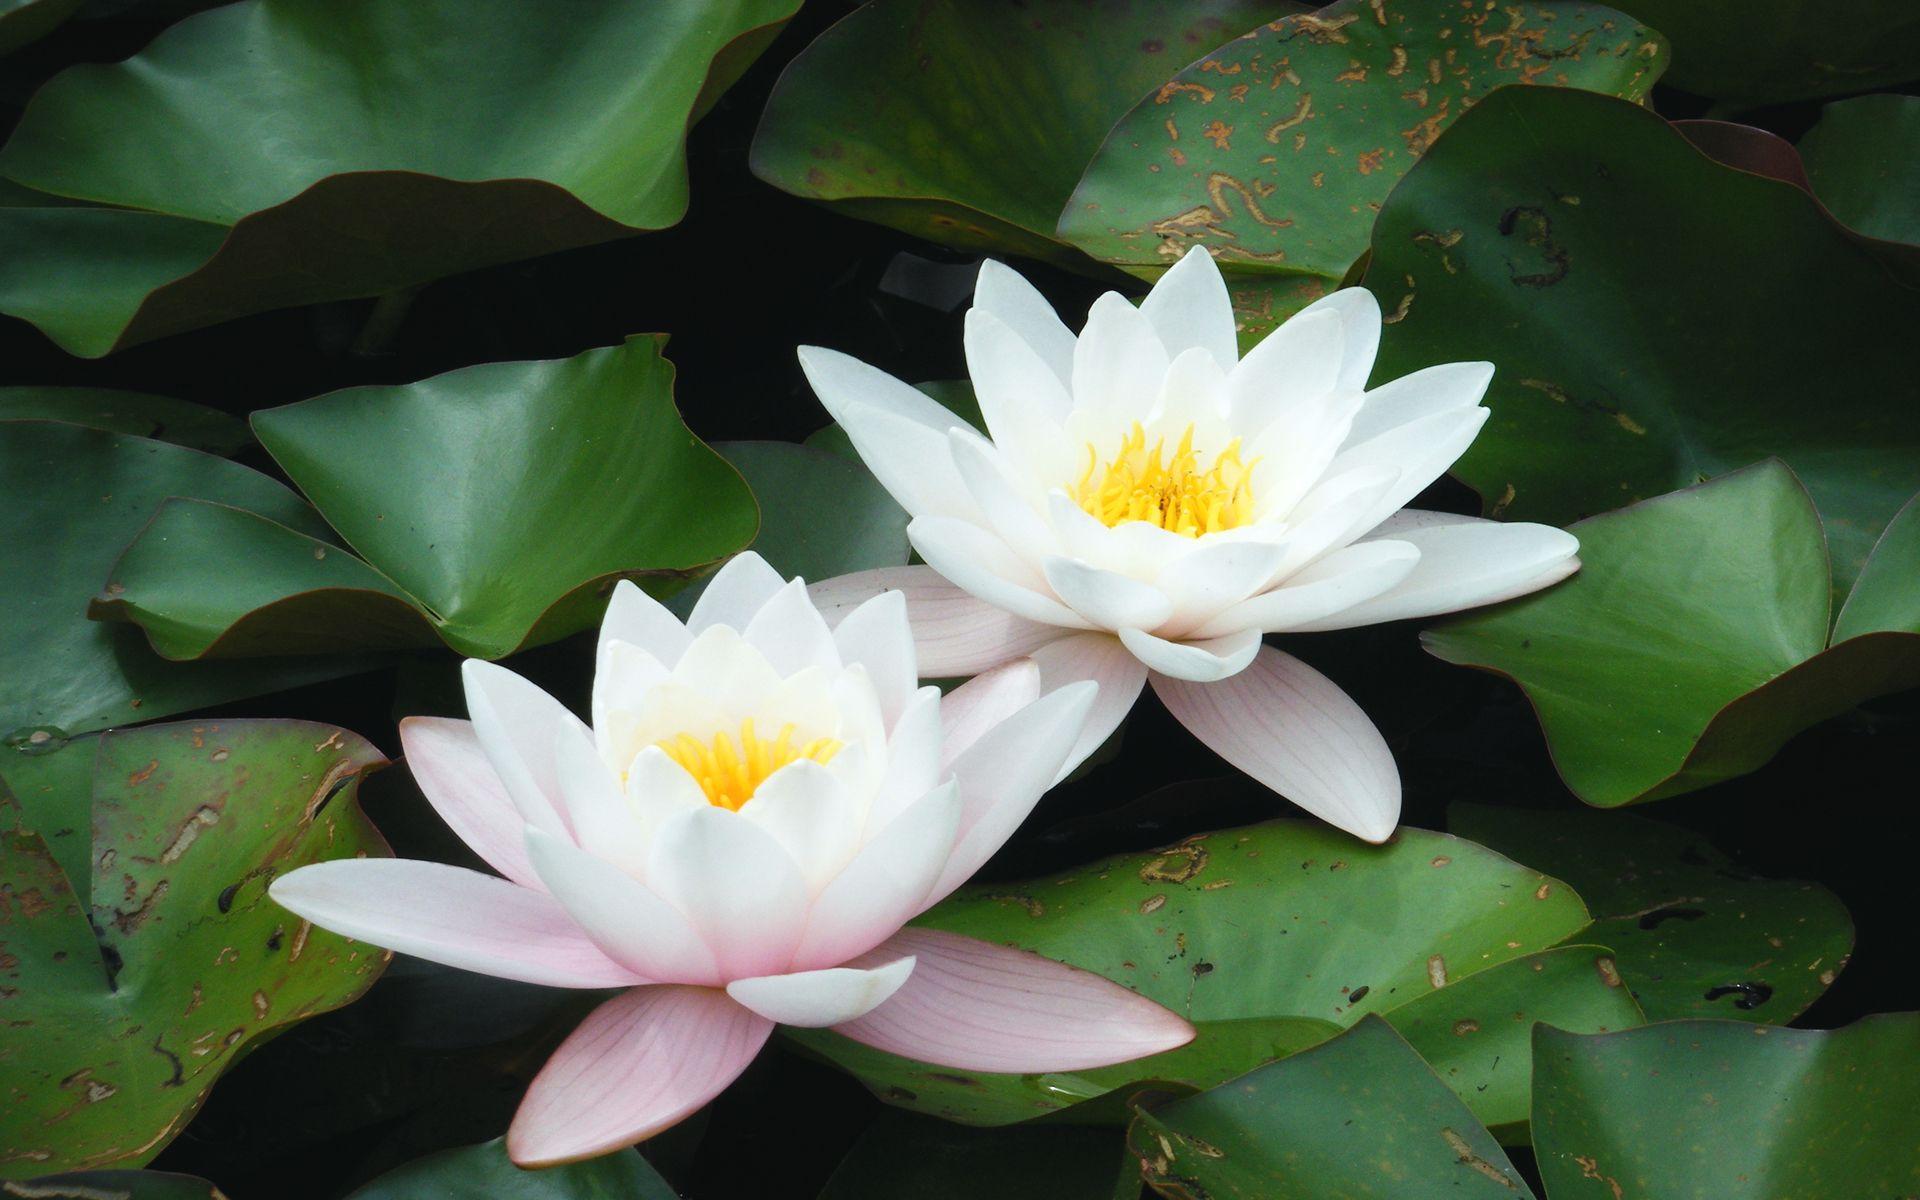 White Lotus Flower Wallpapers HD Wallpaper Black White